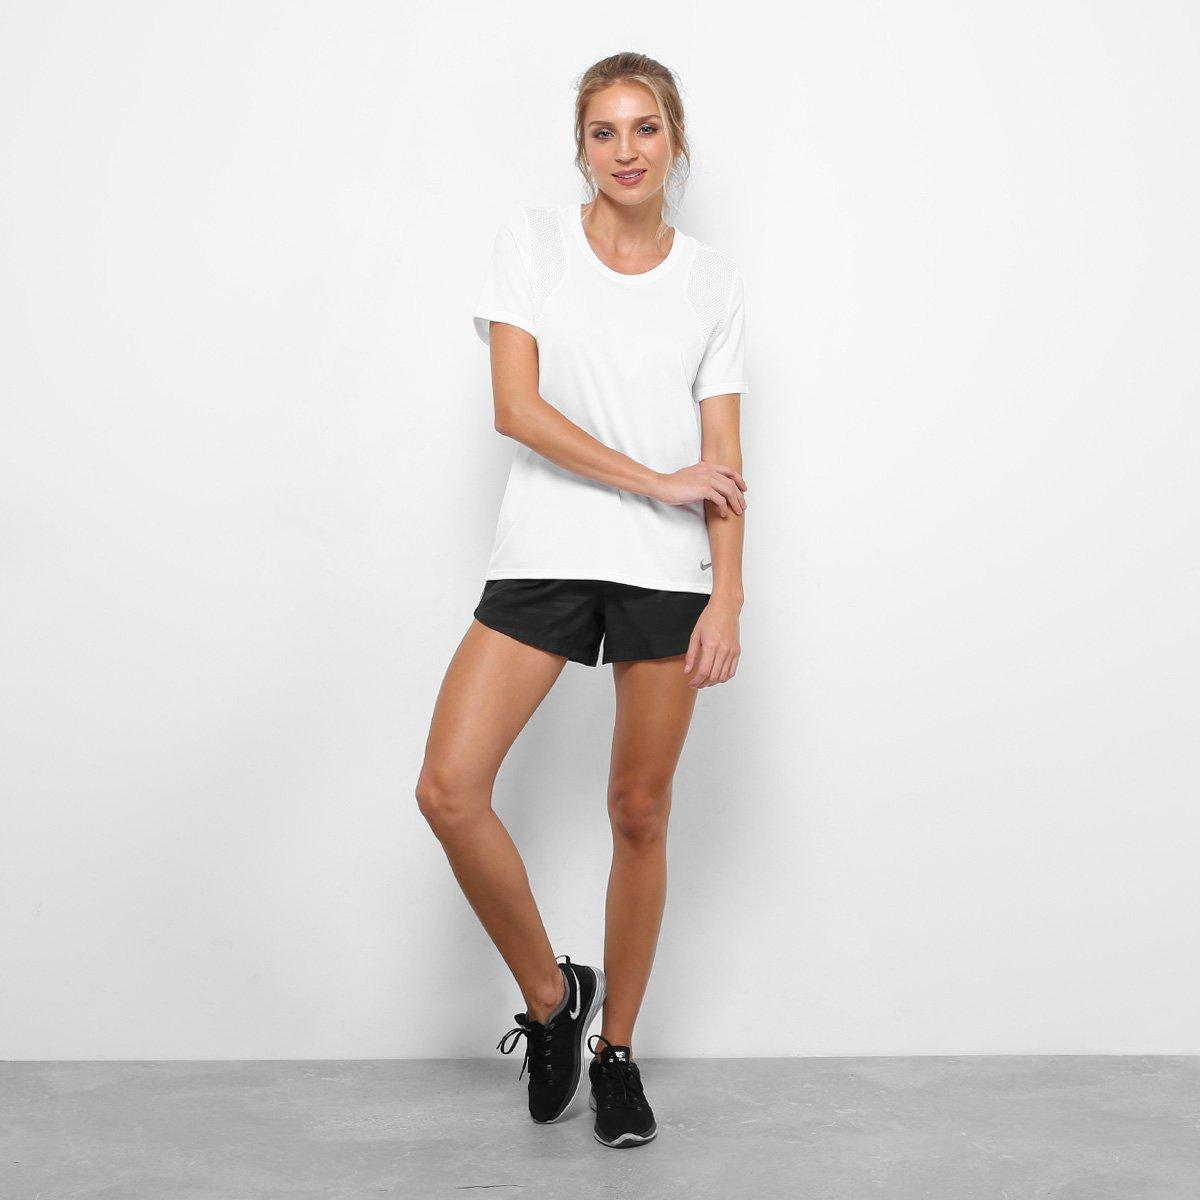 Camiseta Nike Run Ss Feminina - Branco - Compre Agora  38b4cd72f91ed